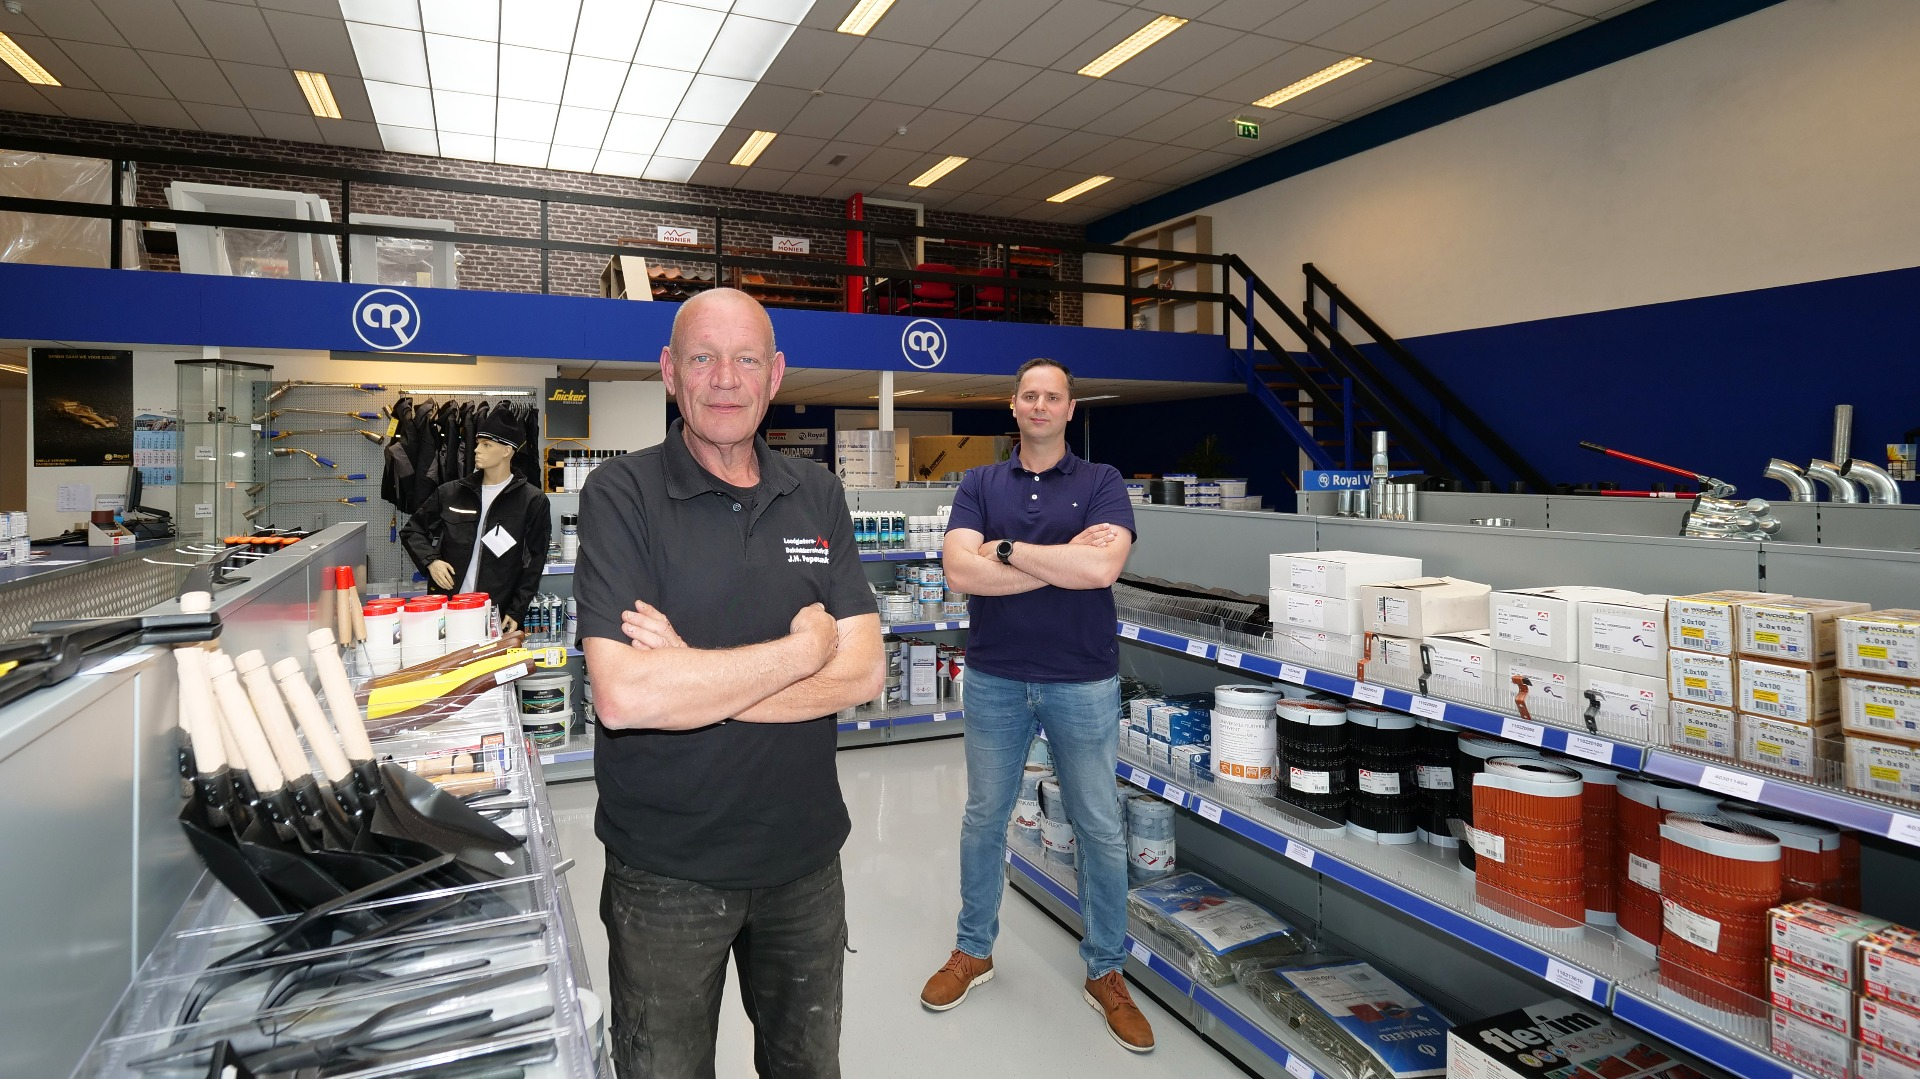 Dagstart met Davy Schreven | Royal dak & bouw Nijmegen